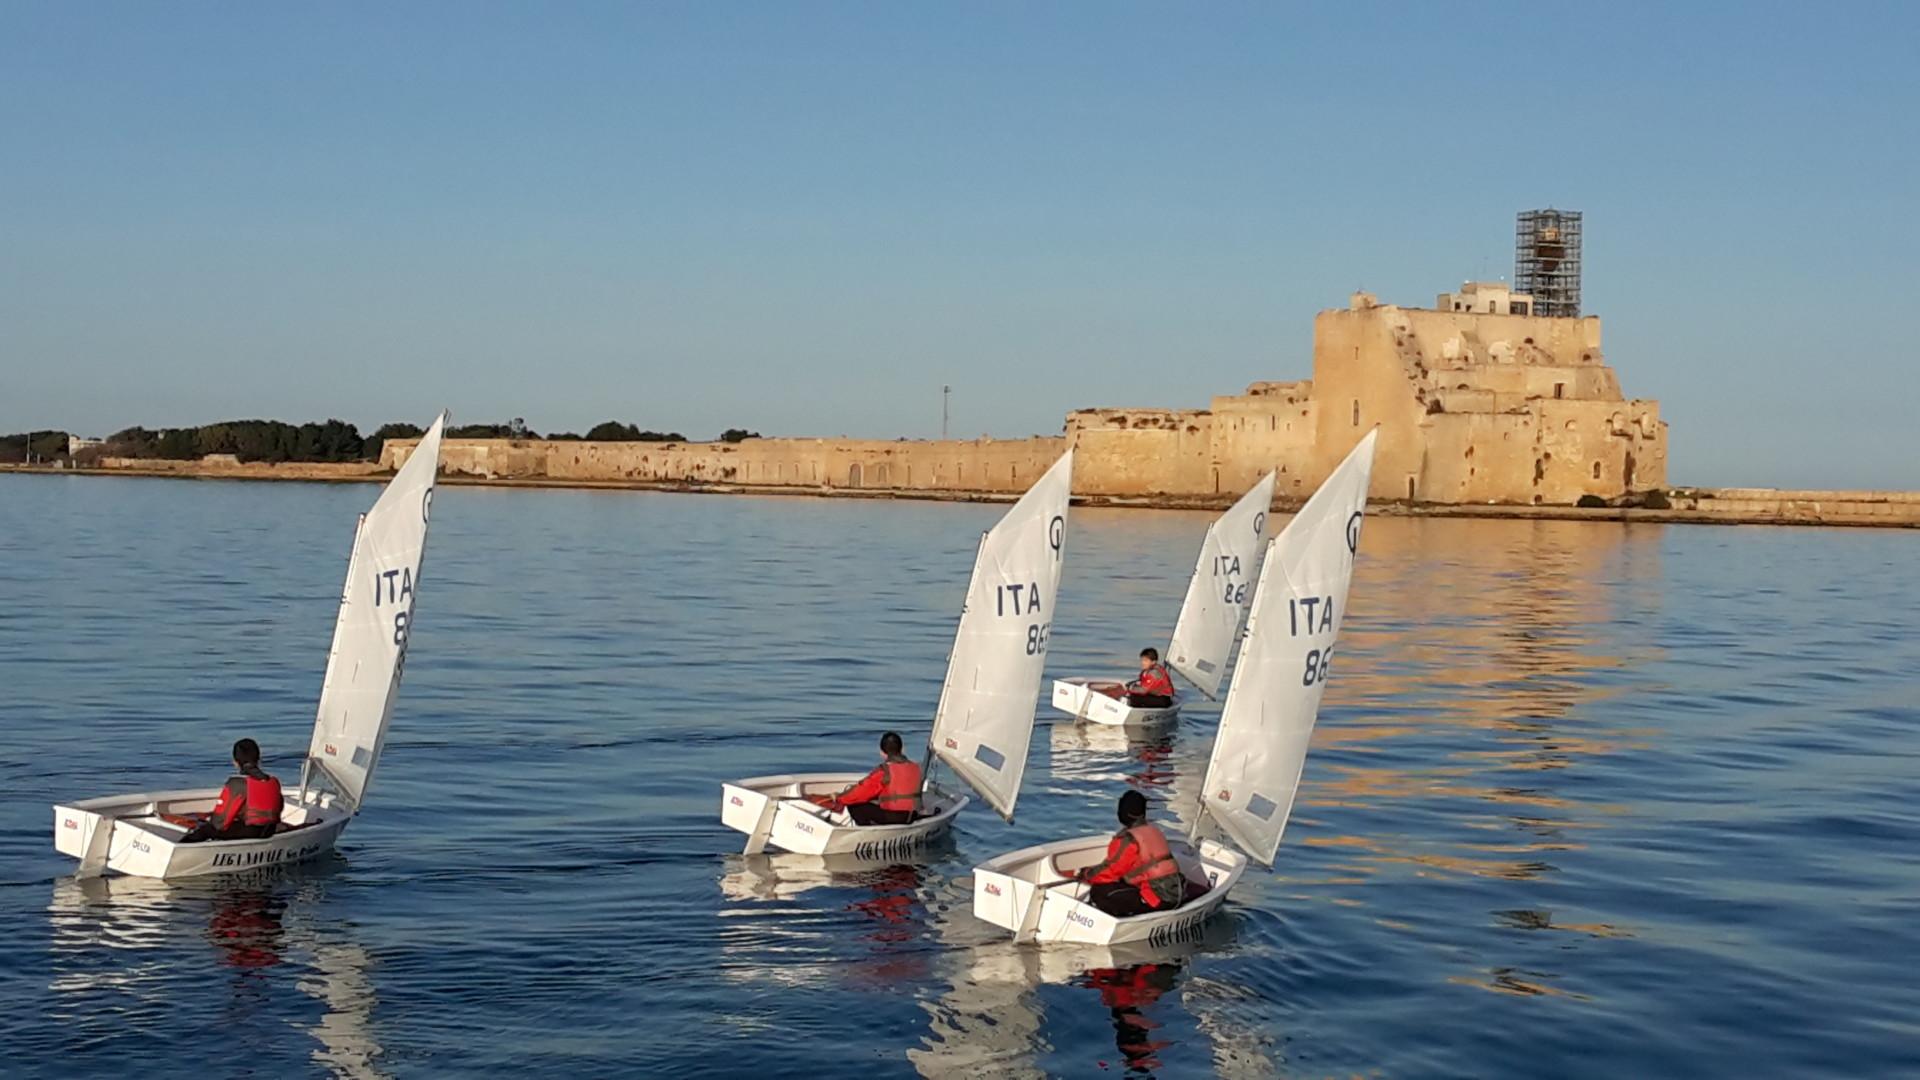 Scuola-di-vela-lega-navale-LNI-Brindisi (5)